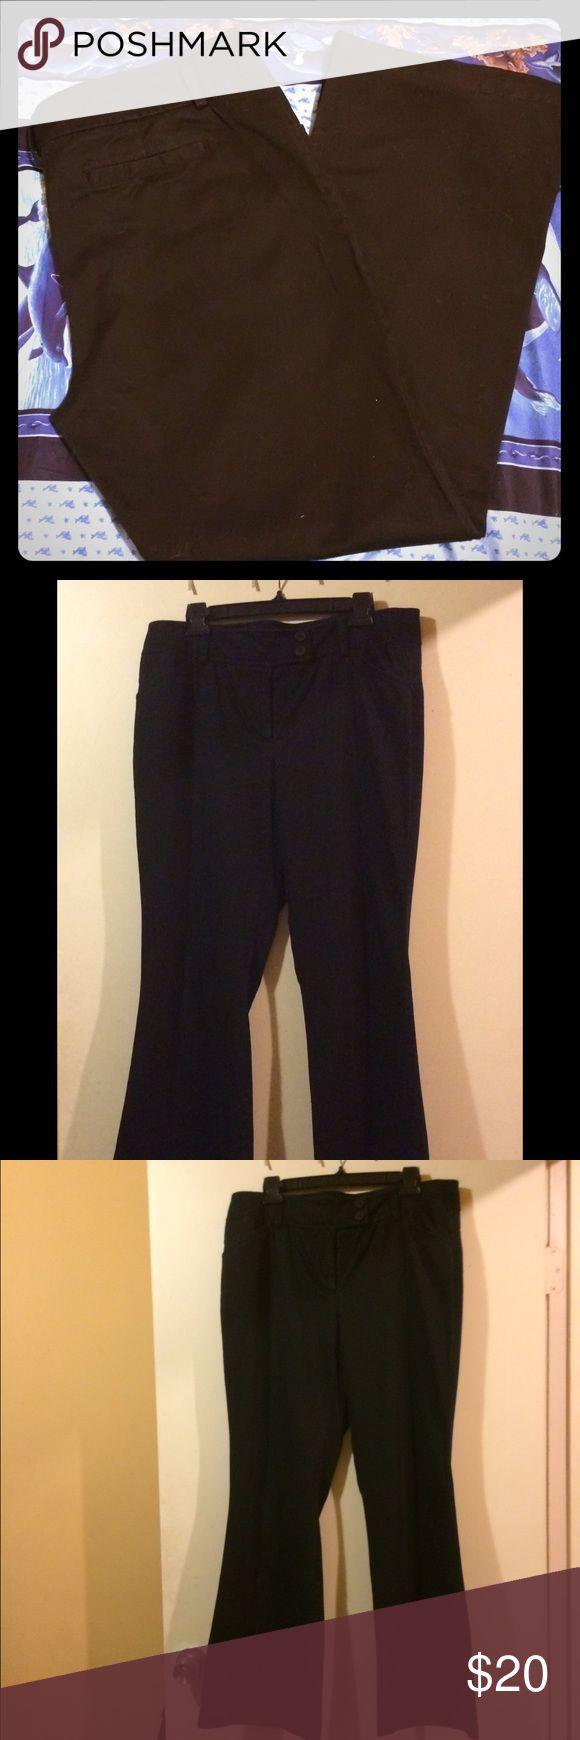 Black Trousers Black khaki trousers. Bootcut. Size 14 Tall. NWOT. Express Pants Trousers